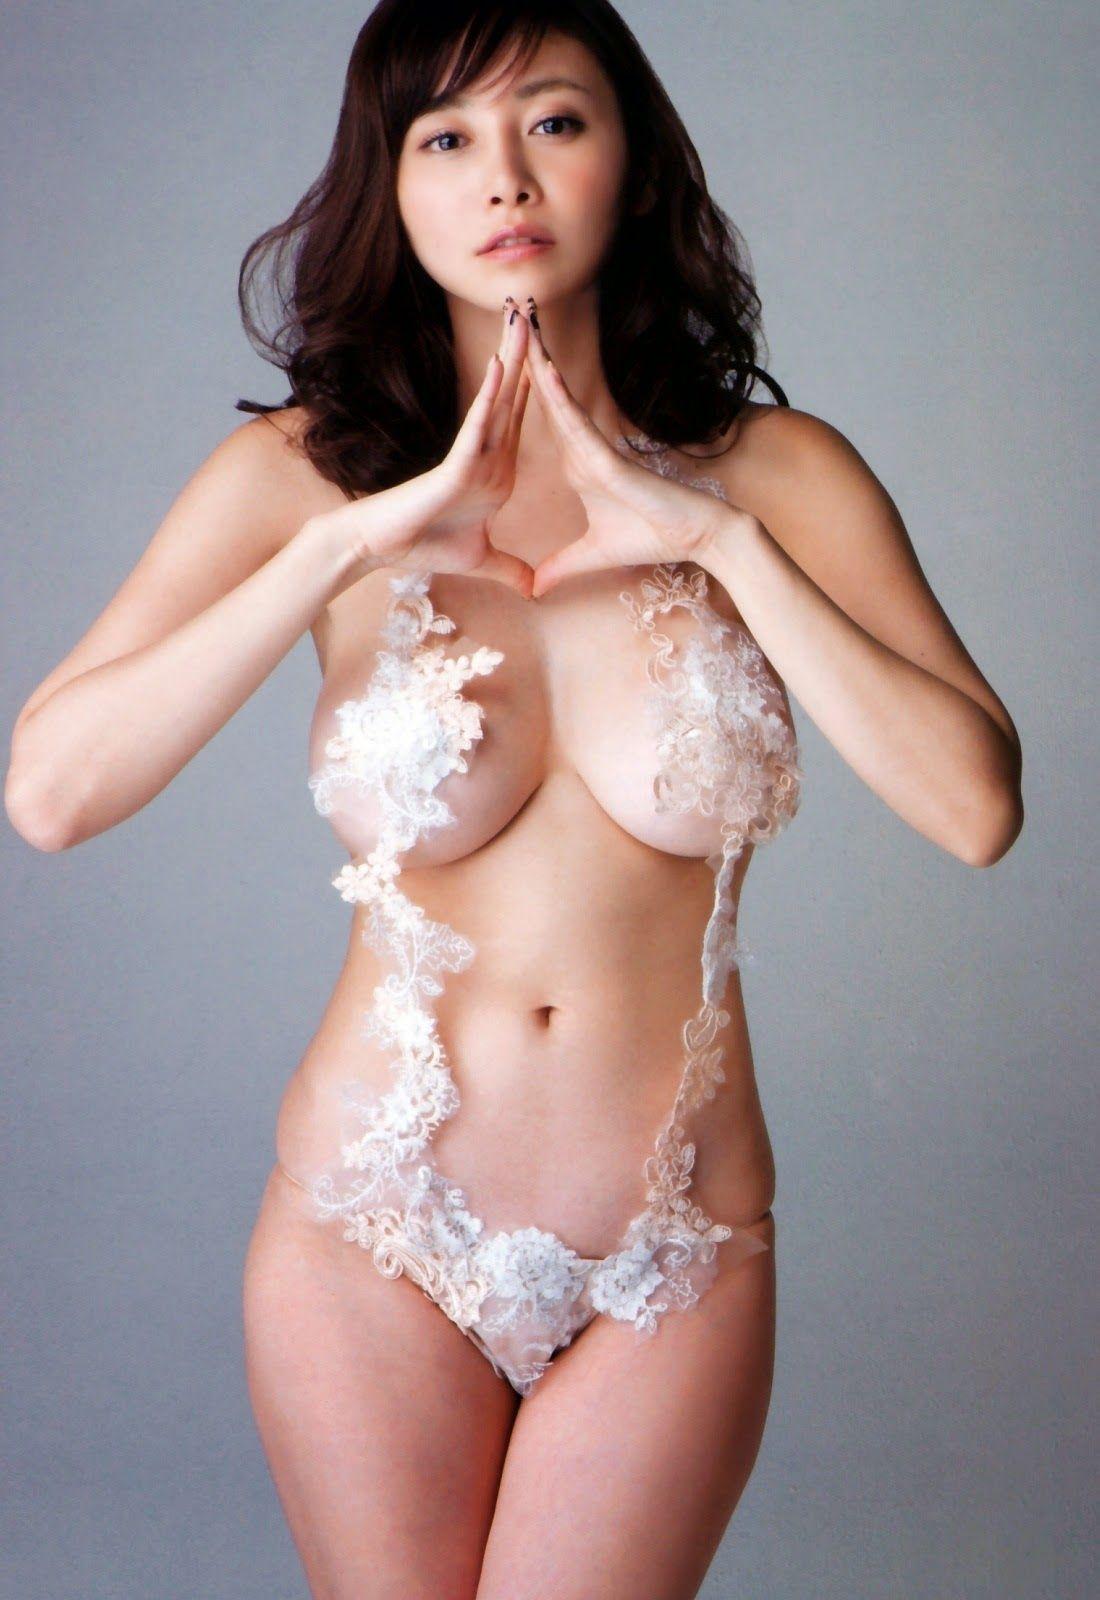 Naked girls nude